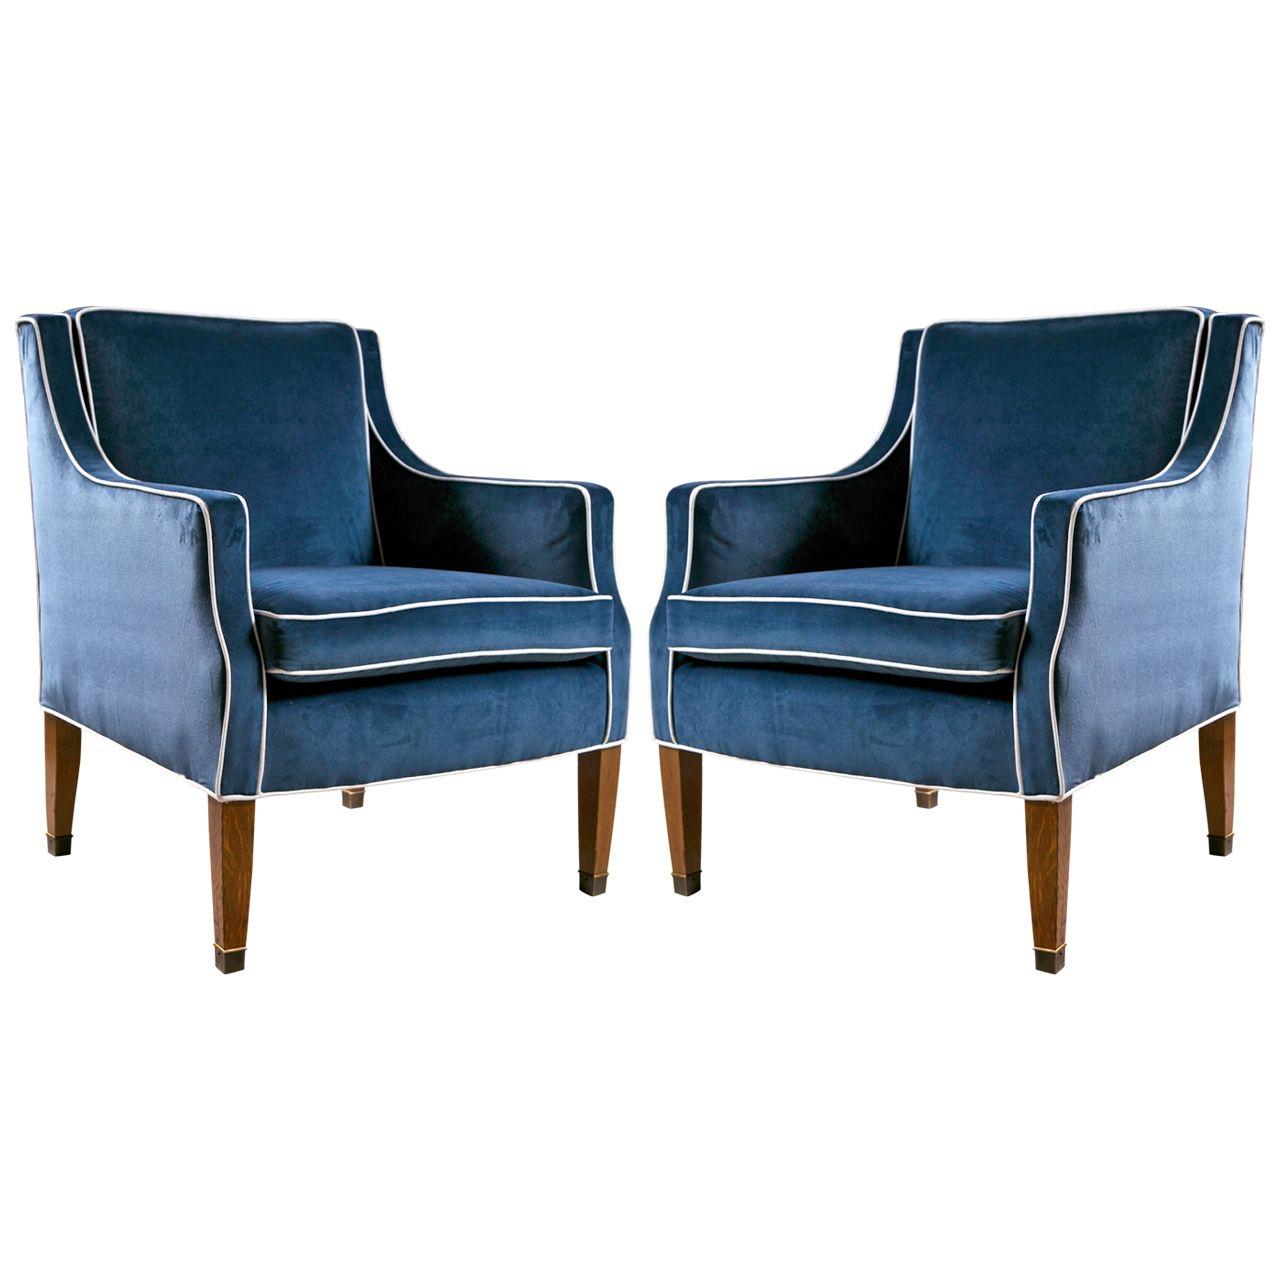 Velvet curtain club - Mid Century Club Chairs With Blue Velvet Upholstery